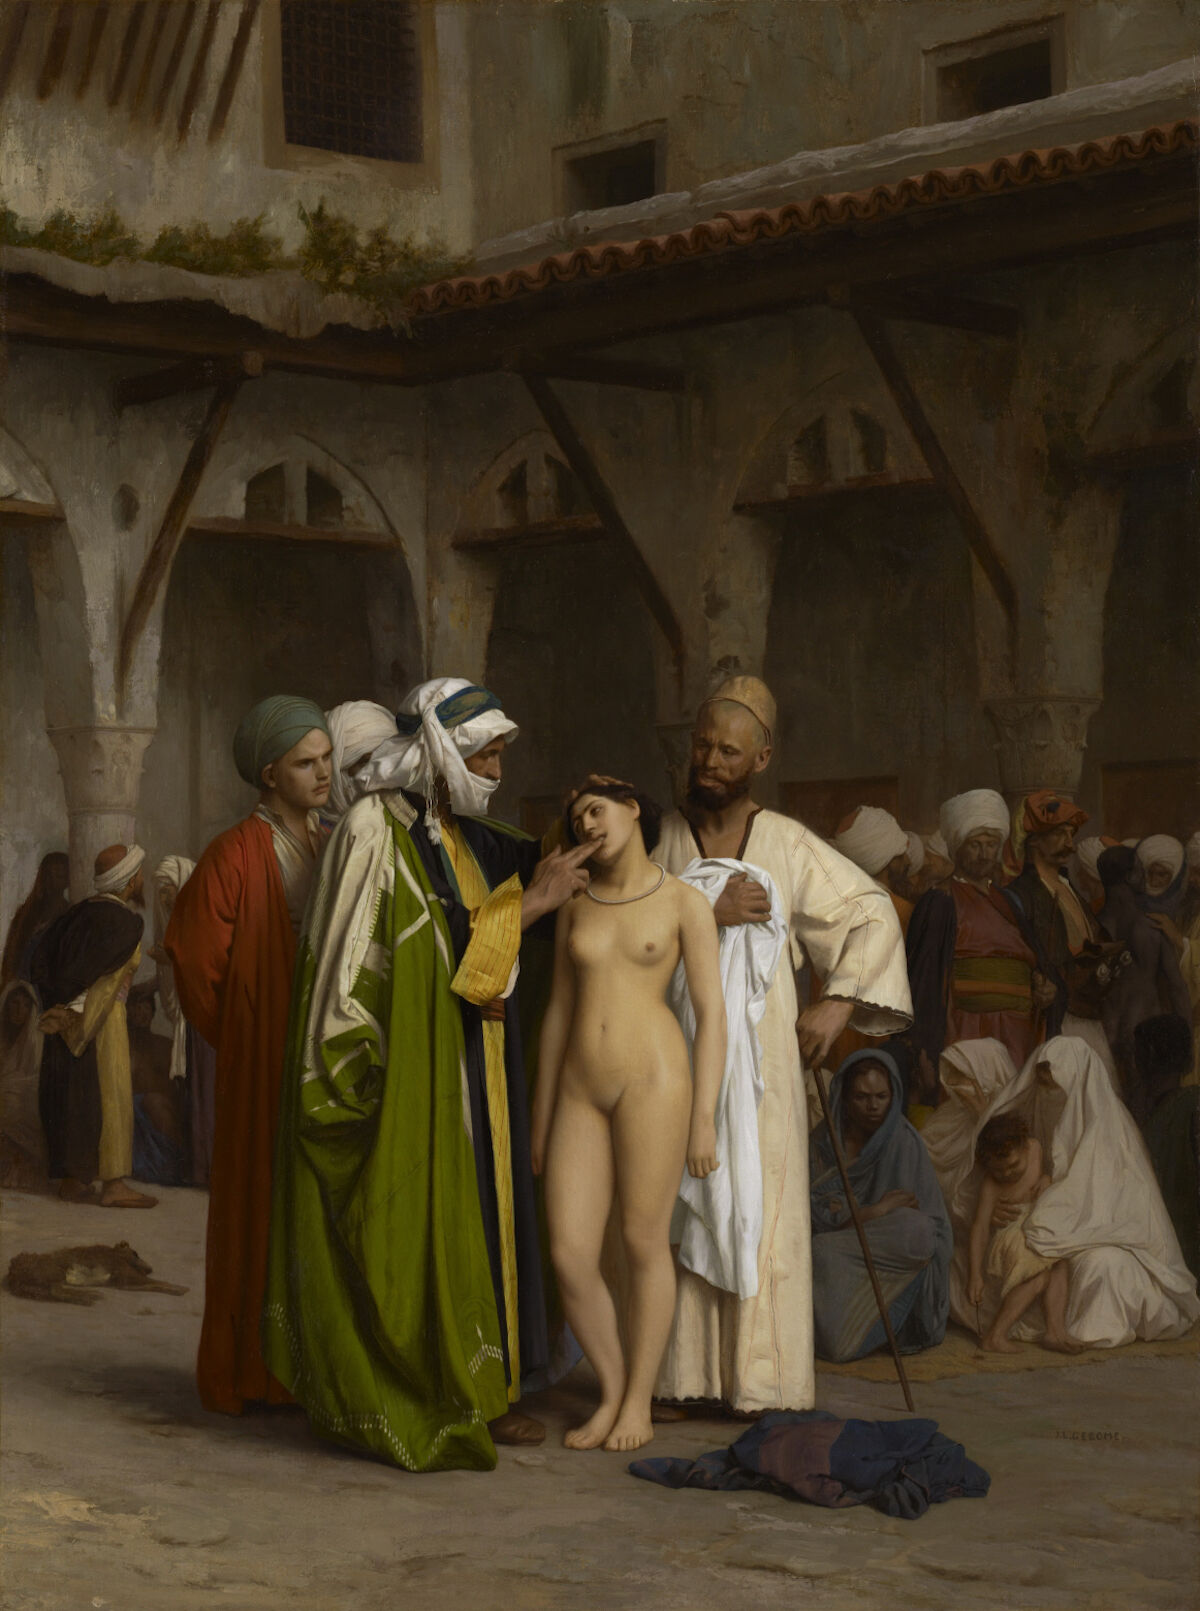 Jean-Léon Gérôme, Slave Market, 1866, Clark Art Institute. Via Wikimedia Commons.